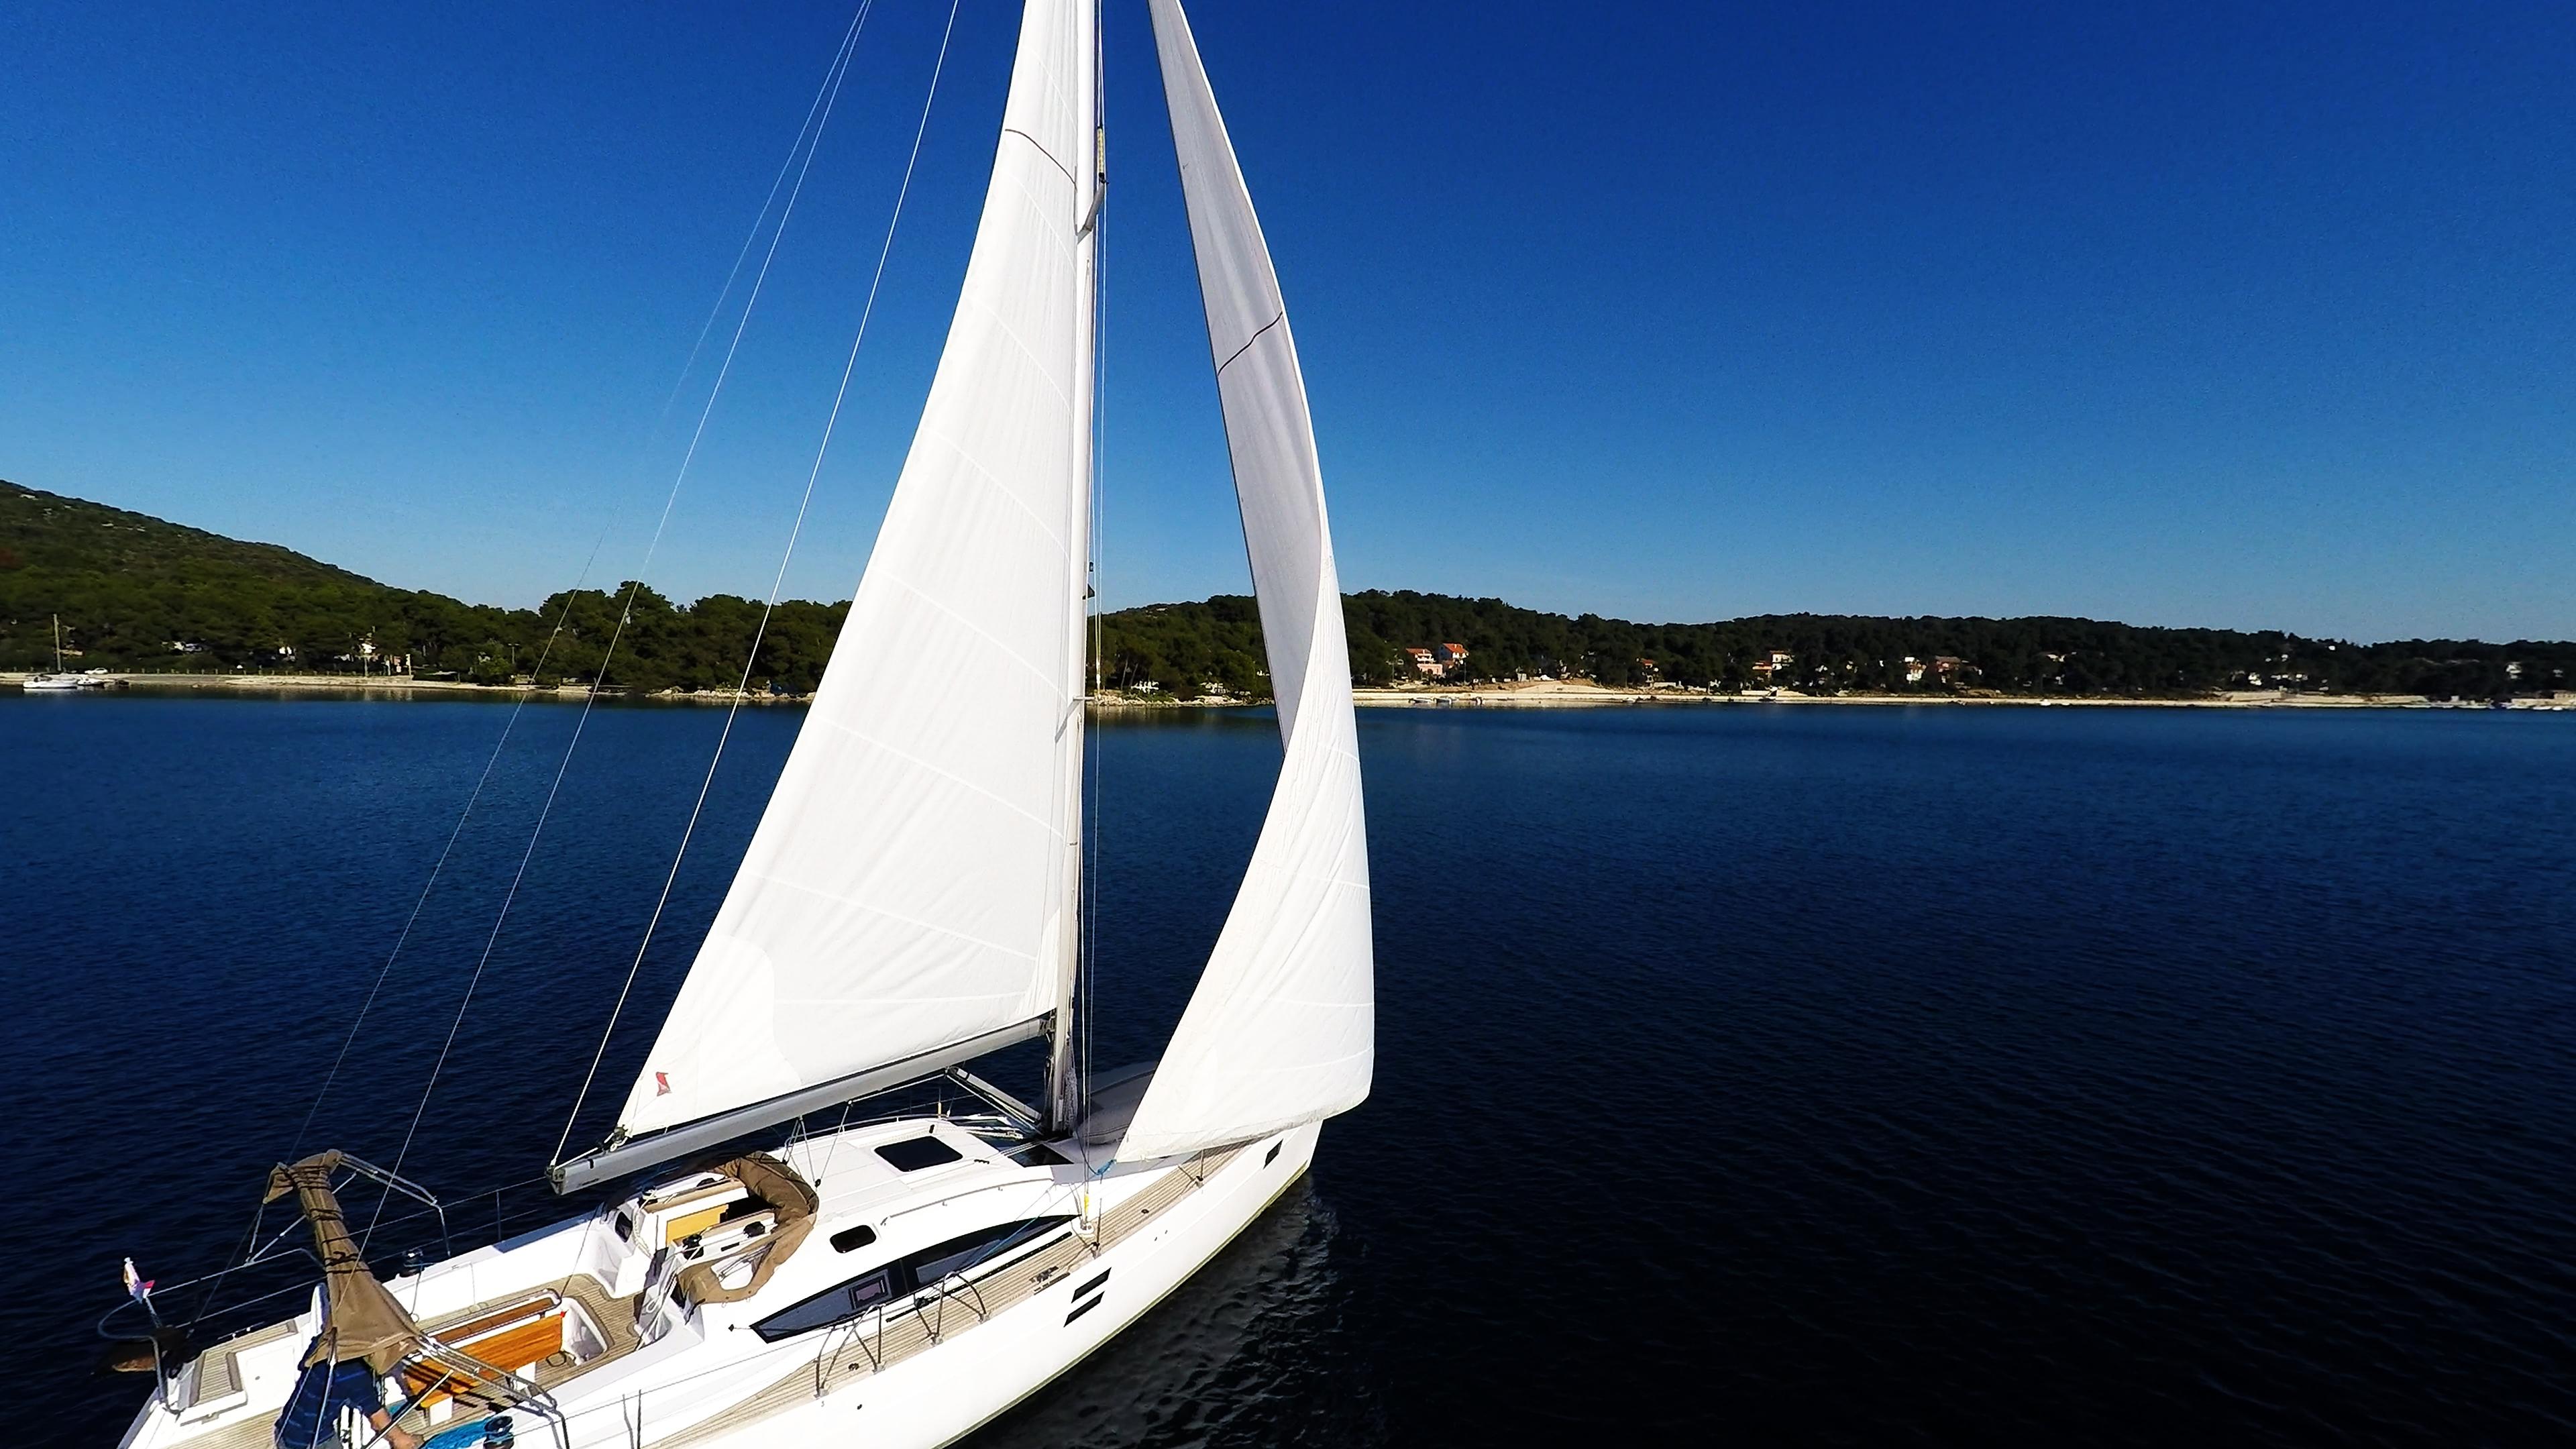 barcha a vela barca a vela yacht a vela cielo blu Croazia baia